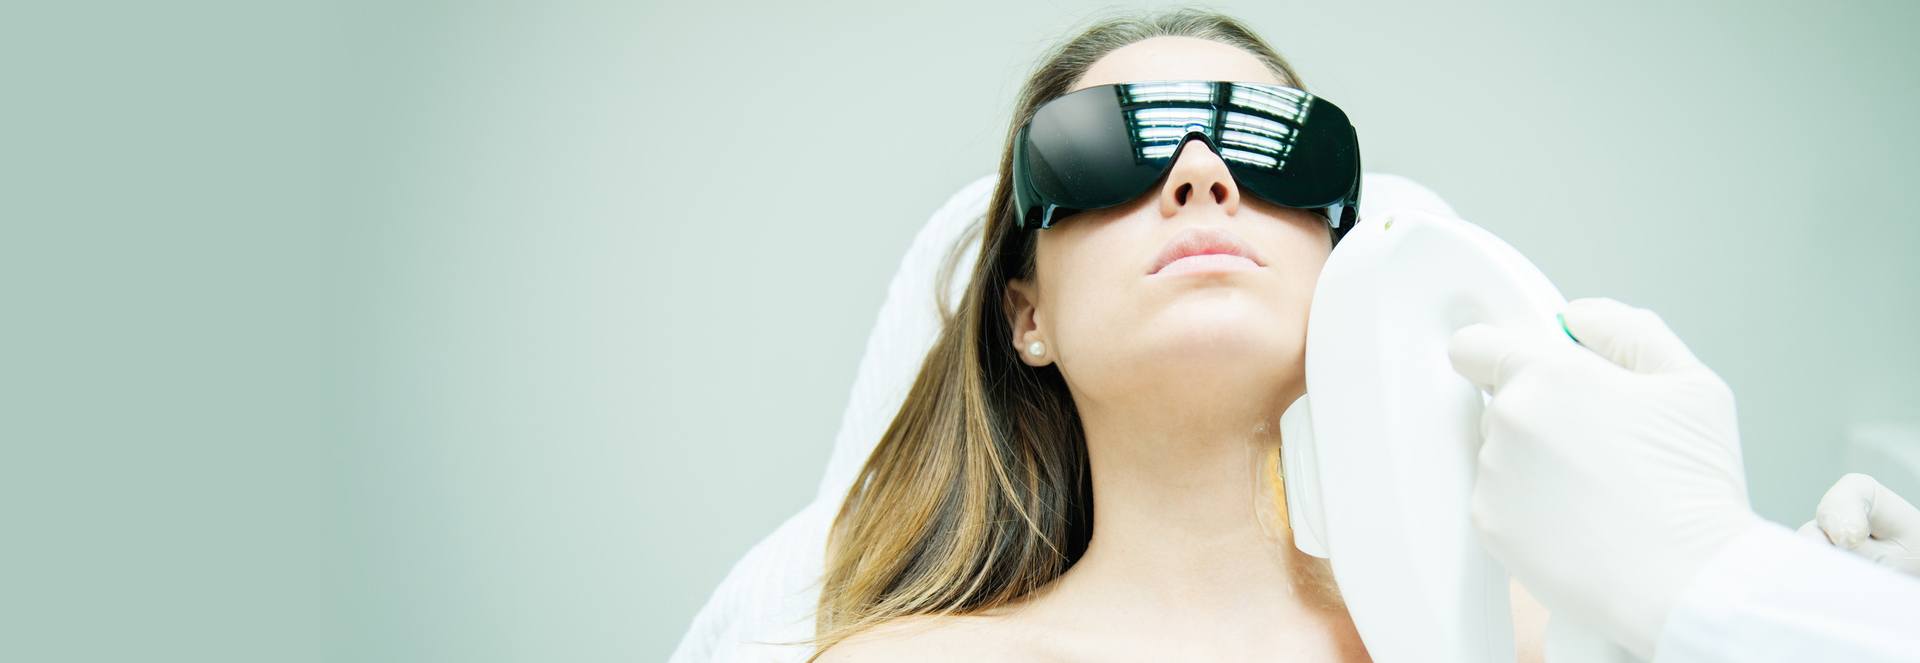 Anti-aging laser treatment